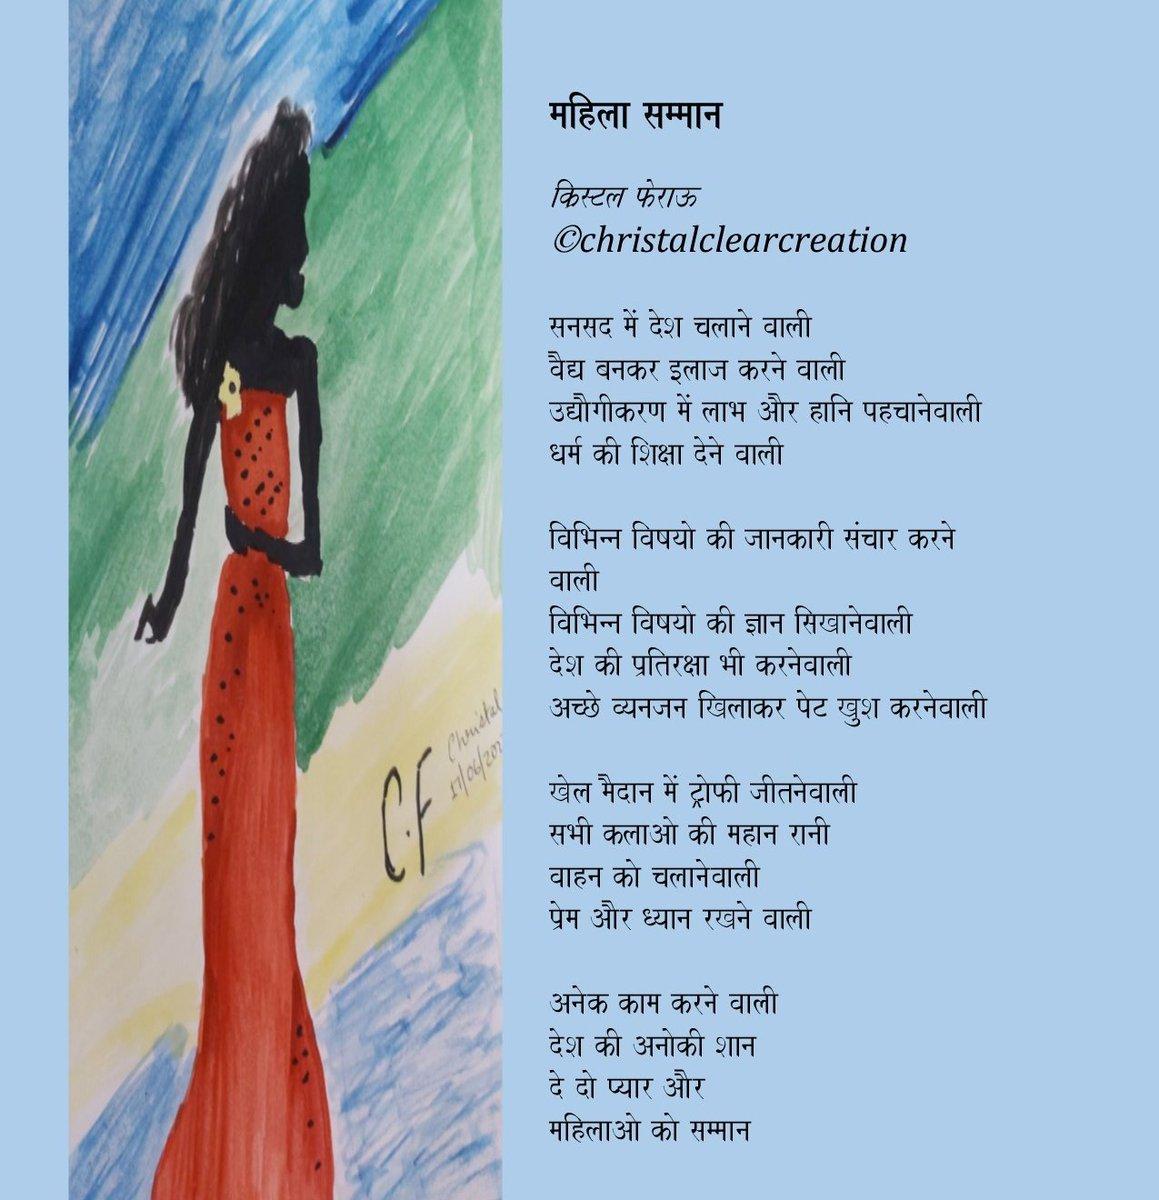 महिला सम्मान- हिन्दी कविता    #कविता #हिंदी_शब्द  #WomensHistoryMonth #wednesdaythought #womenempowerment #poem #Goa #Pune #India